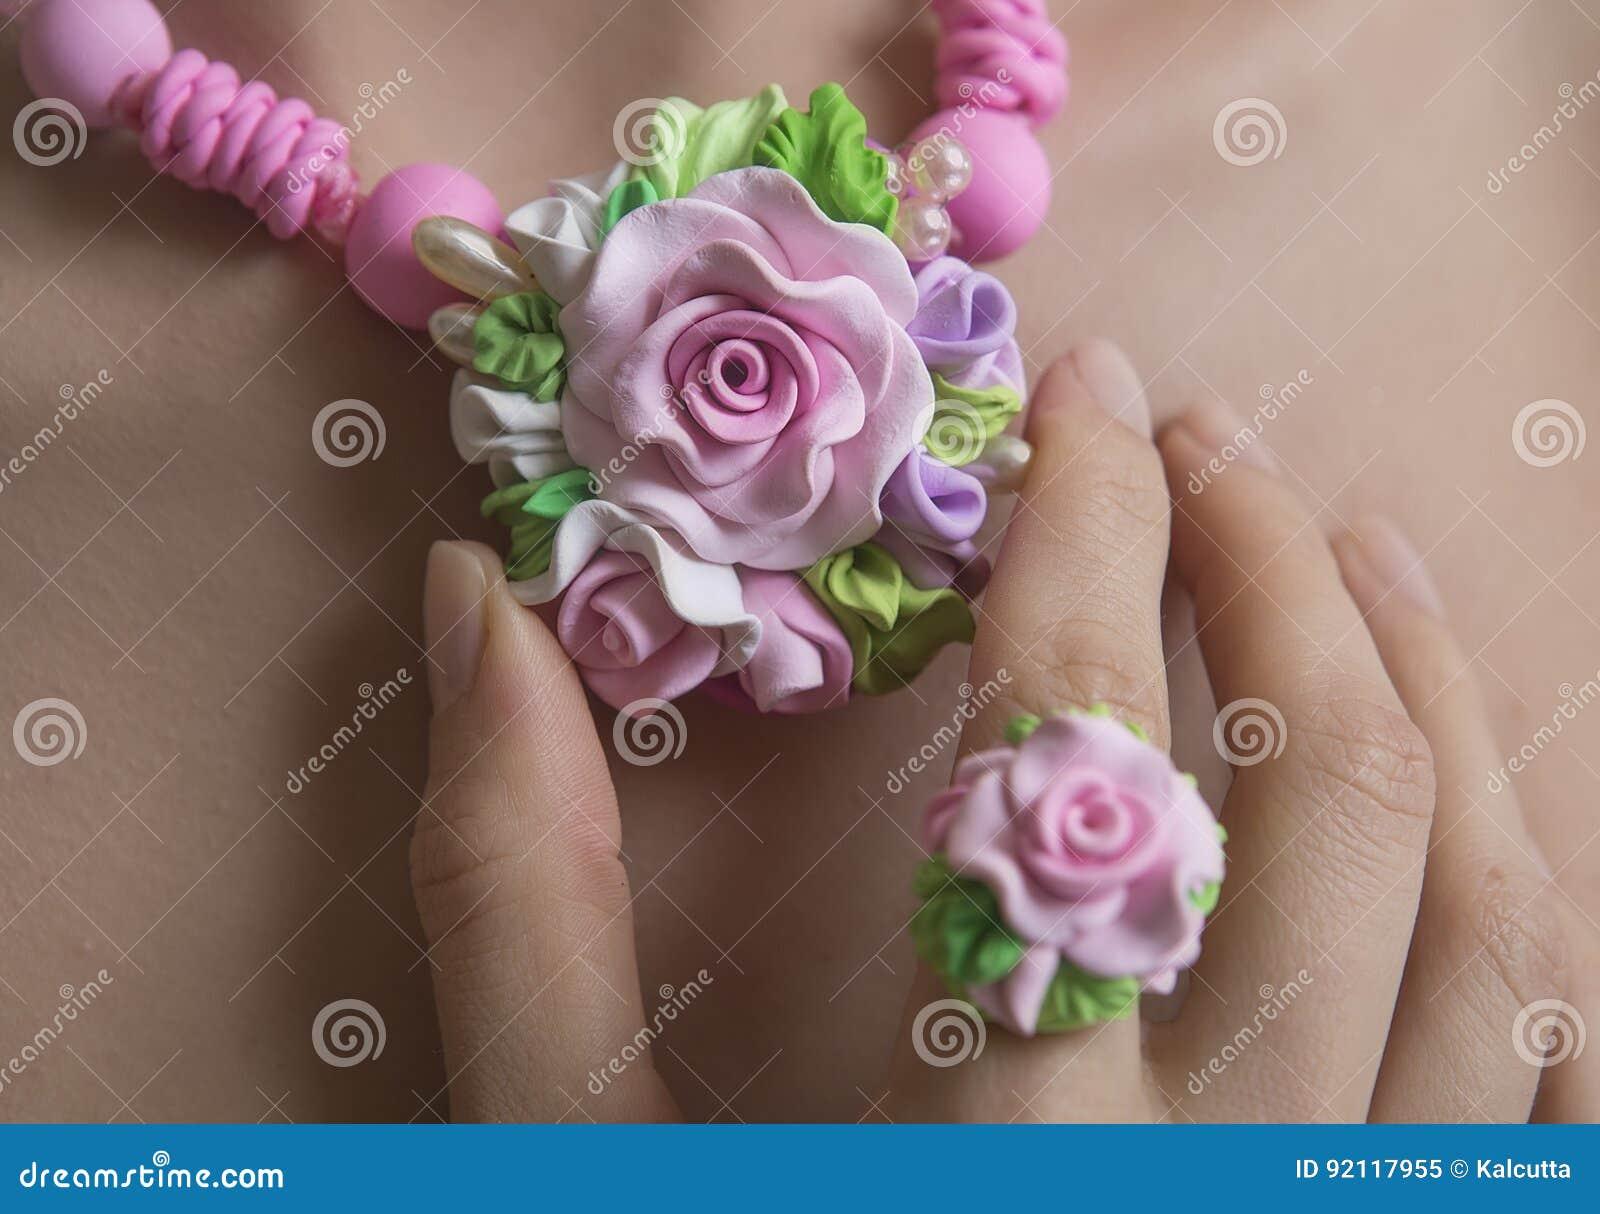 Romantic Style: Floral Rose Necklace Fashion Studio Shot of a J